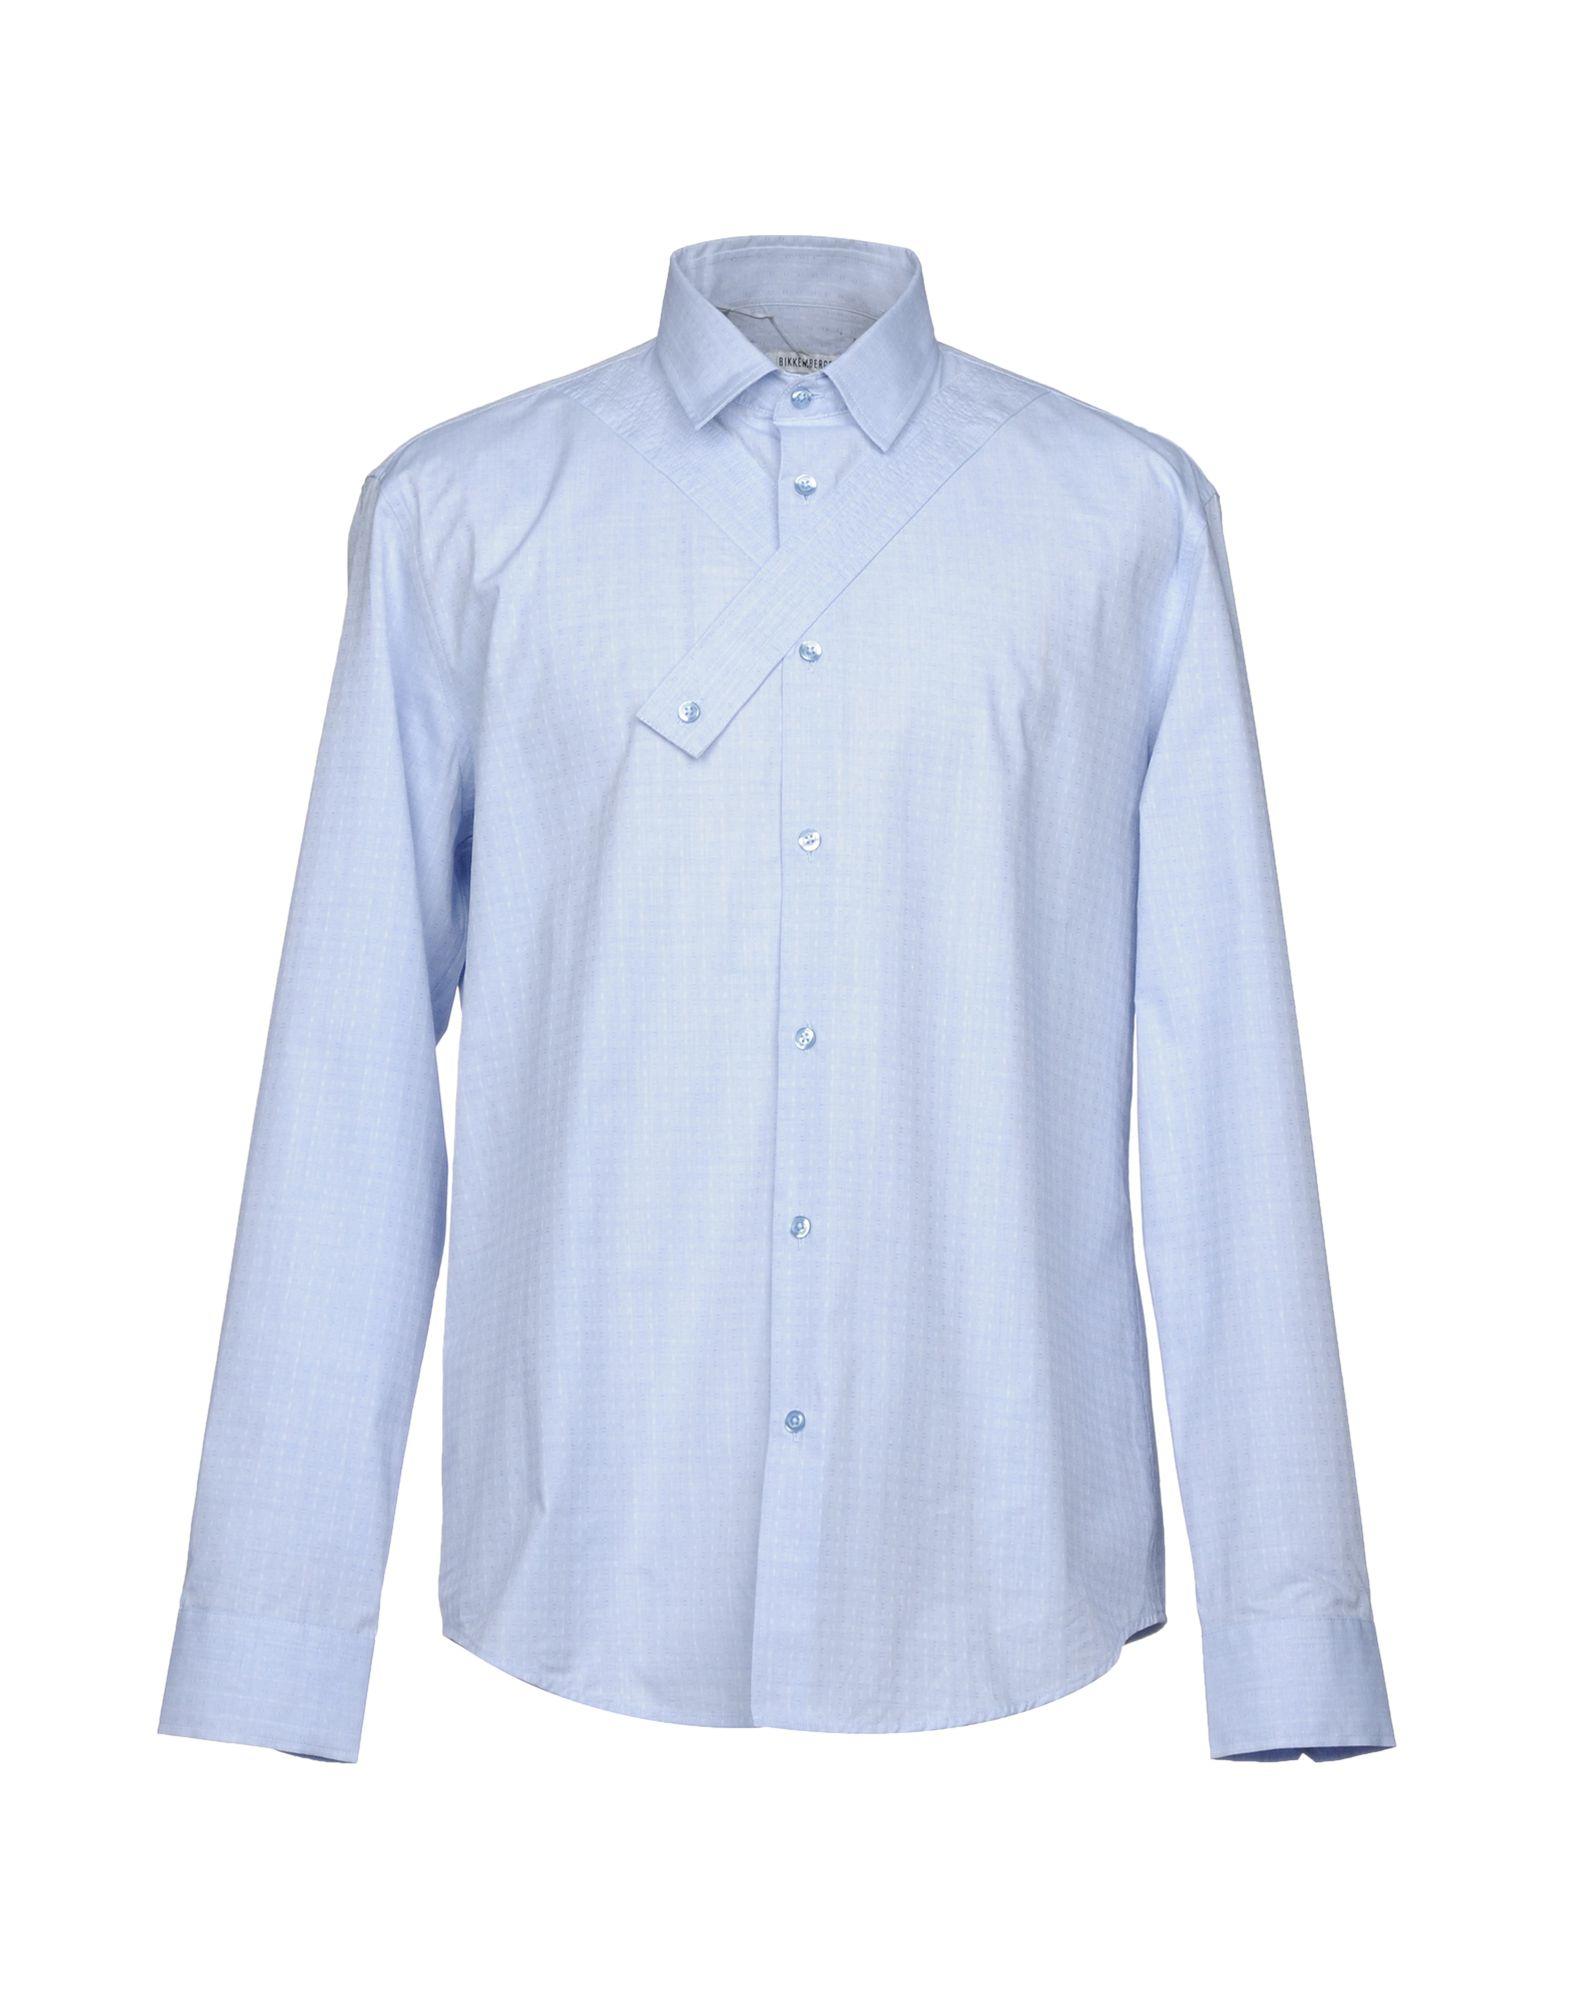 Camicia Tinta Unita Bikkembergs Uomo - Acquista online su